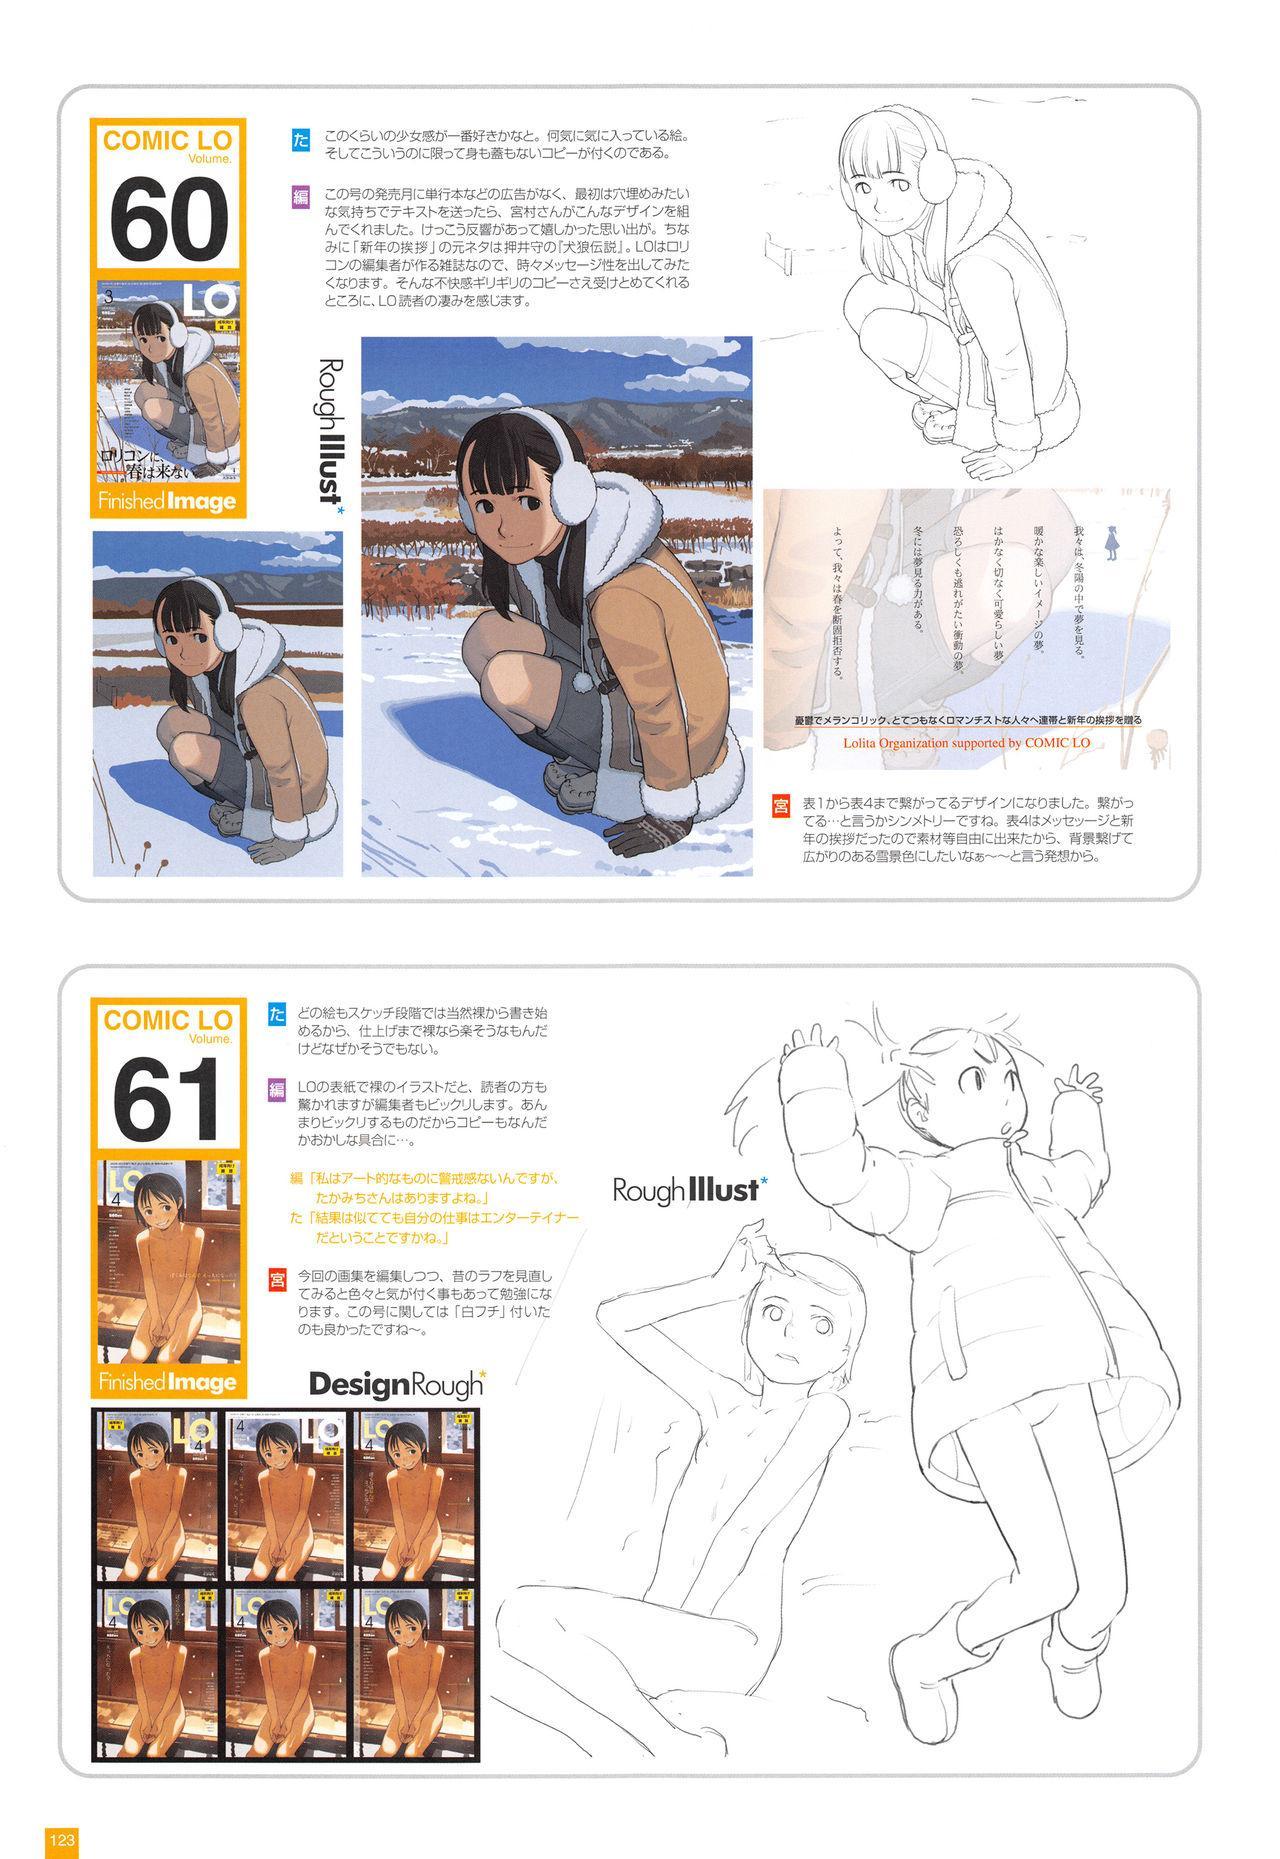 LO Artbook 2-A TAKAMICHI LOOP WORKS 125